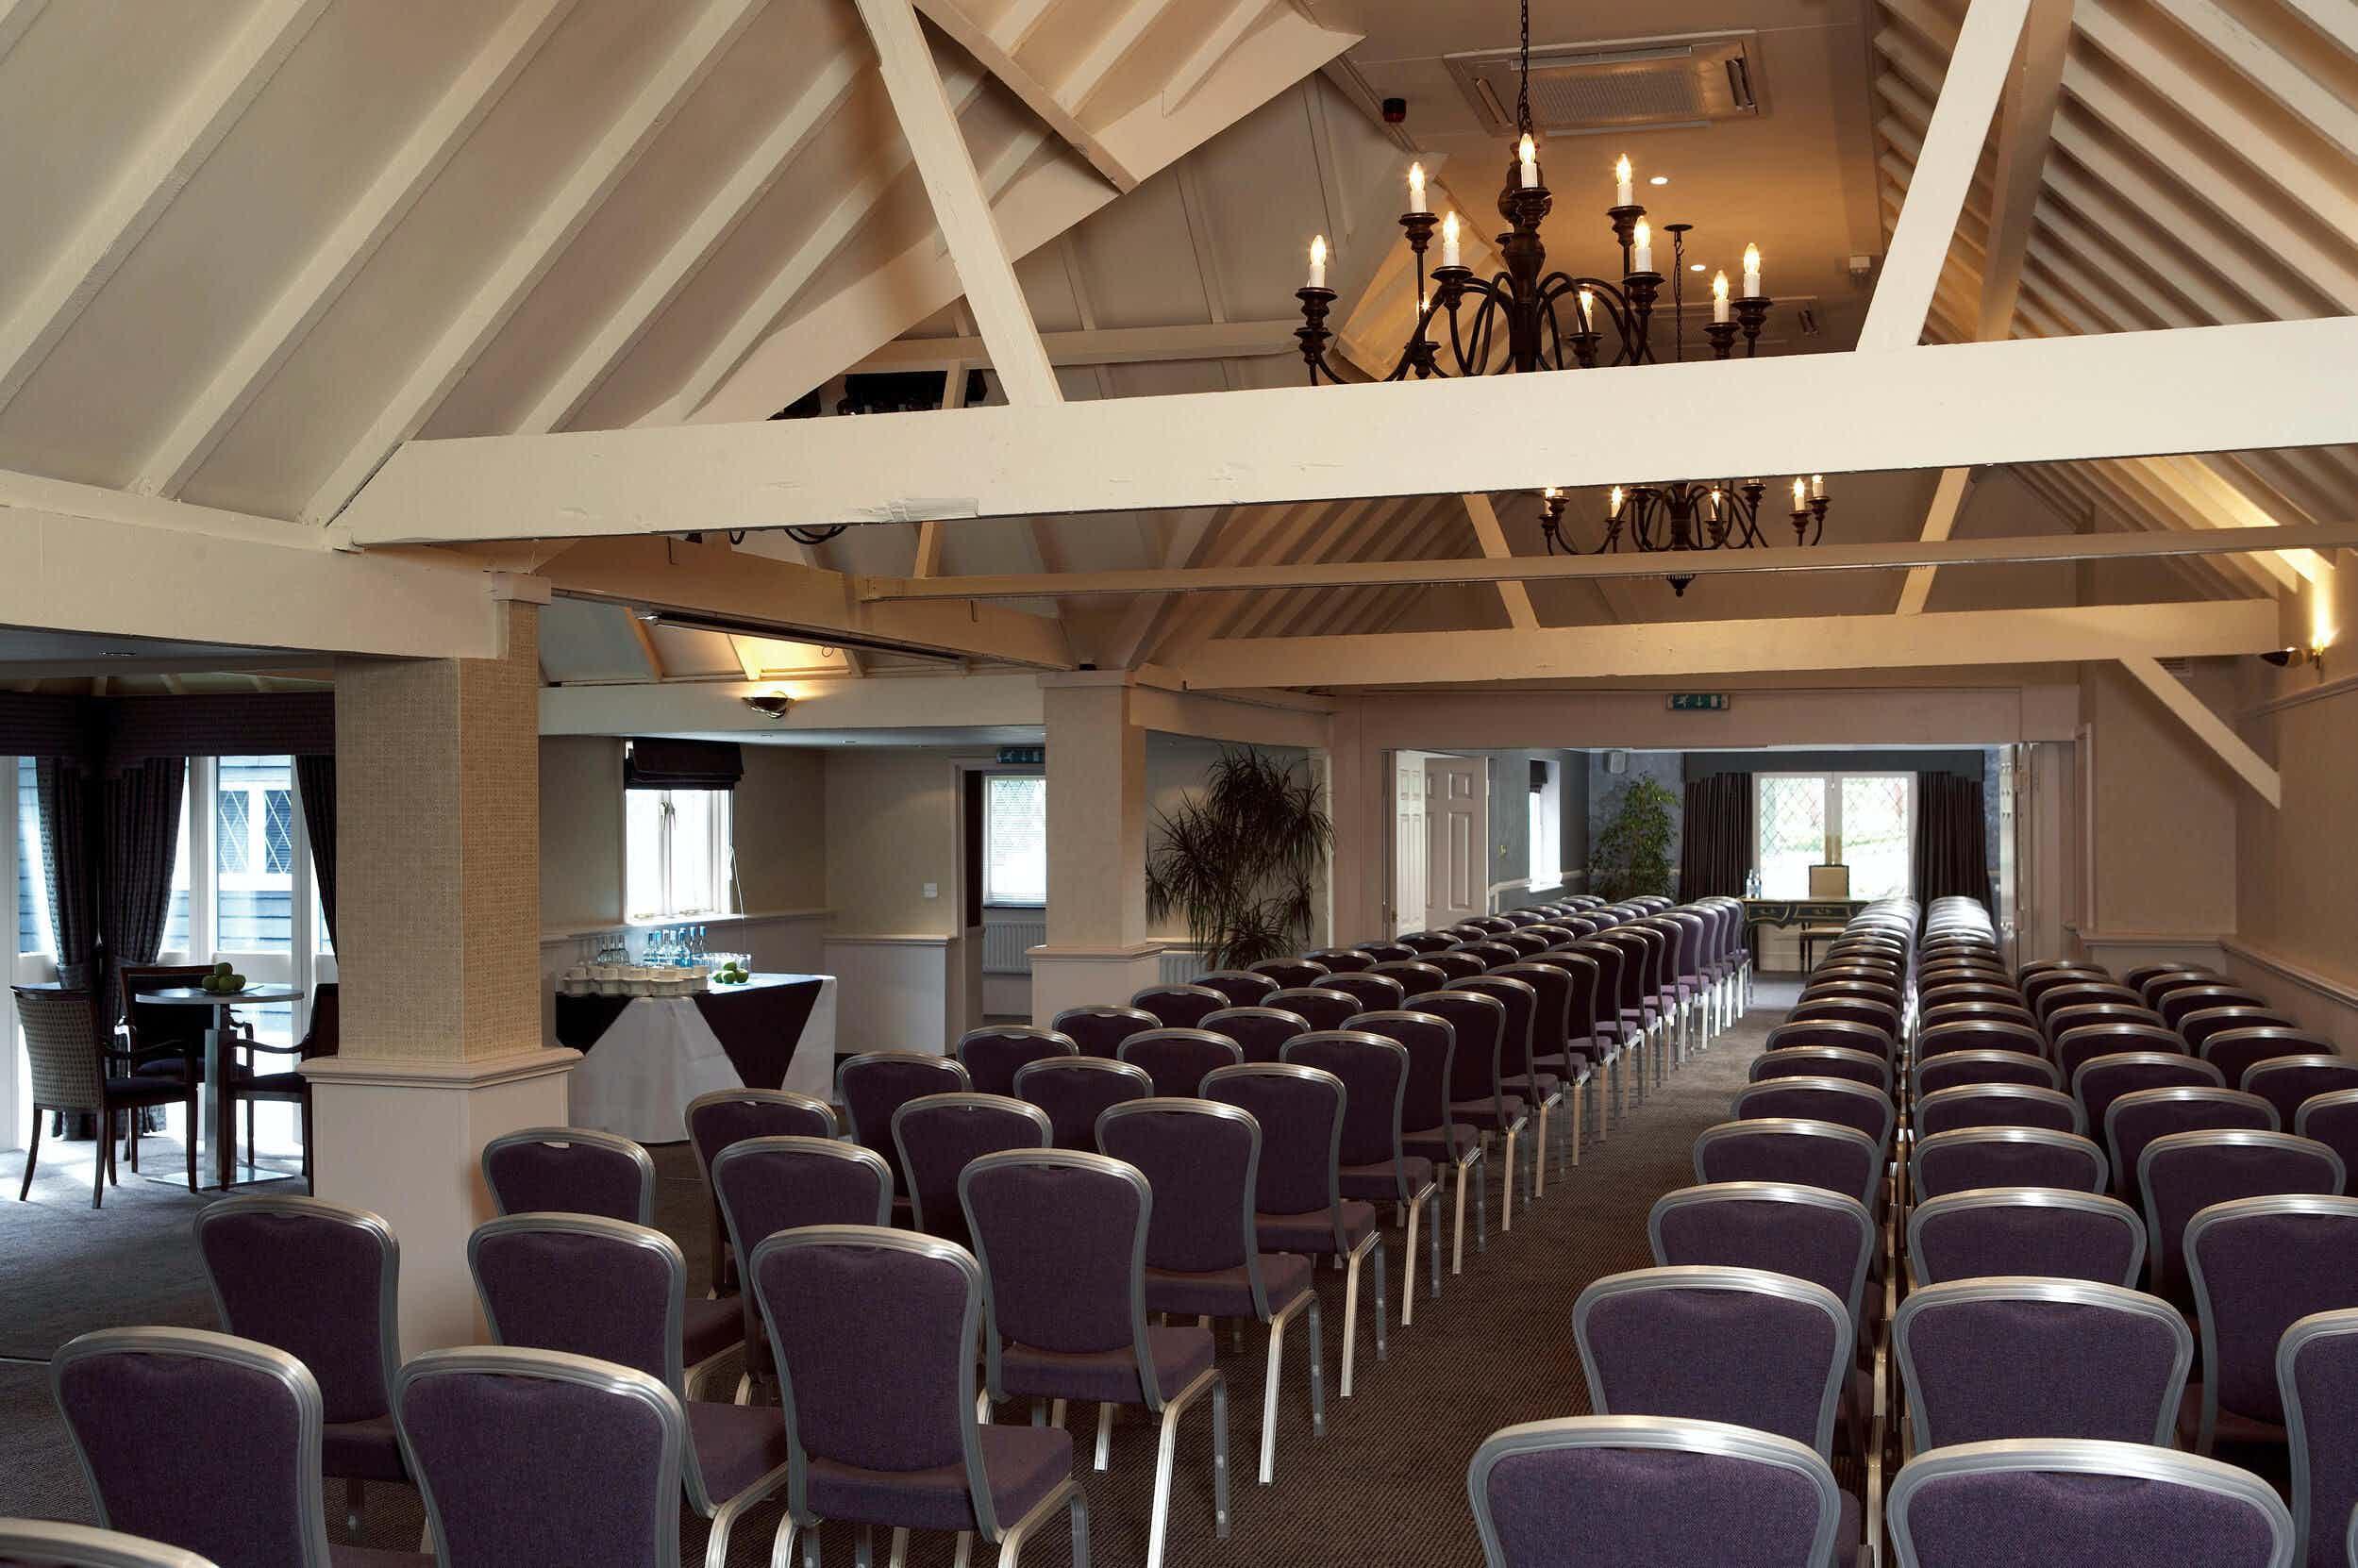 The Clockhouse Suite, Rowhill Grange